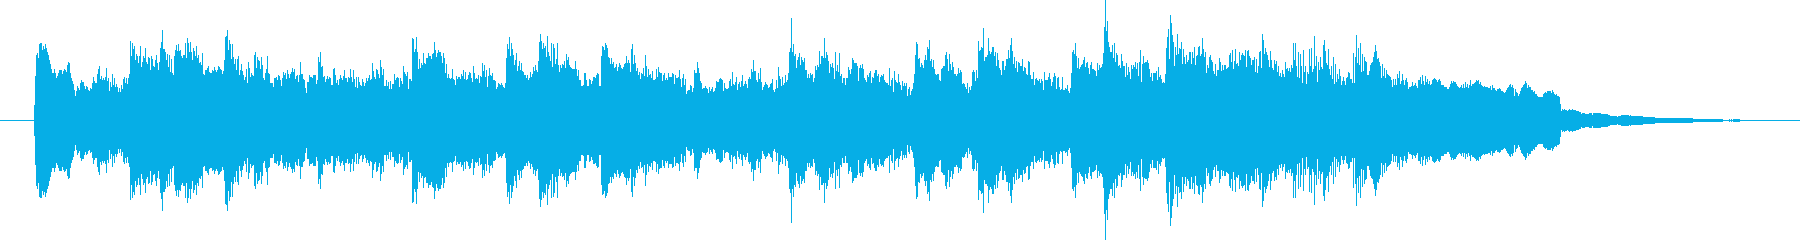 Stille Nacht(チャイム)の再生済みの波形